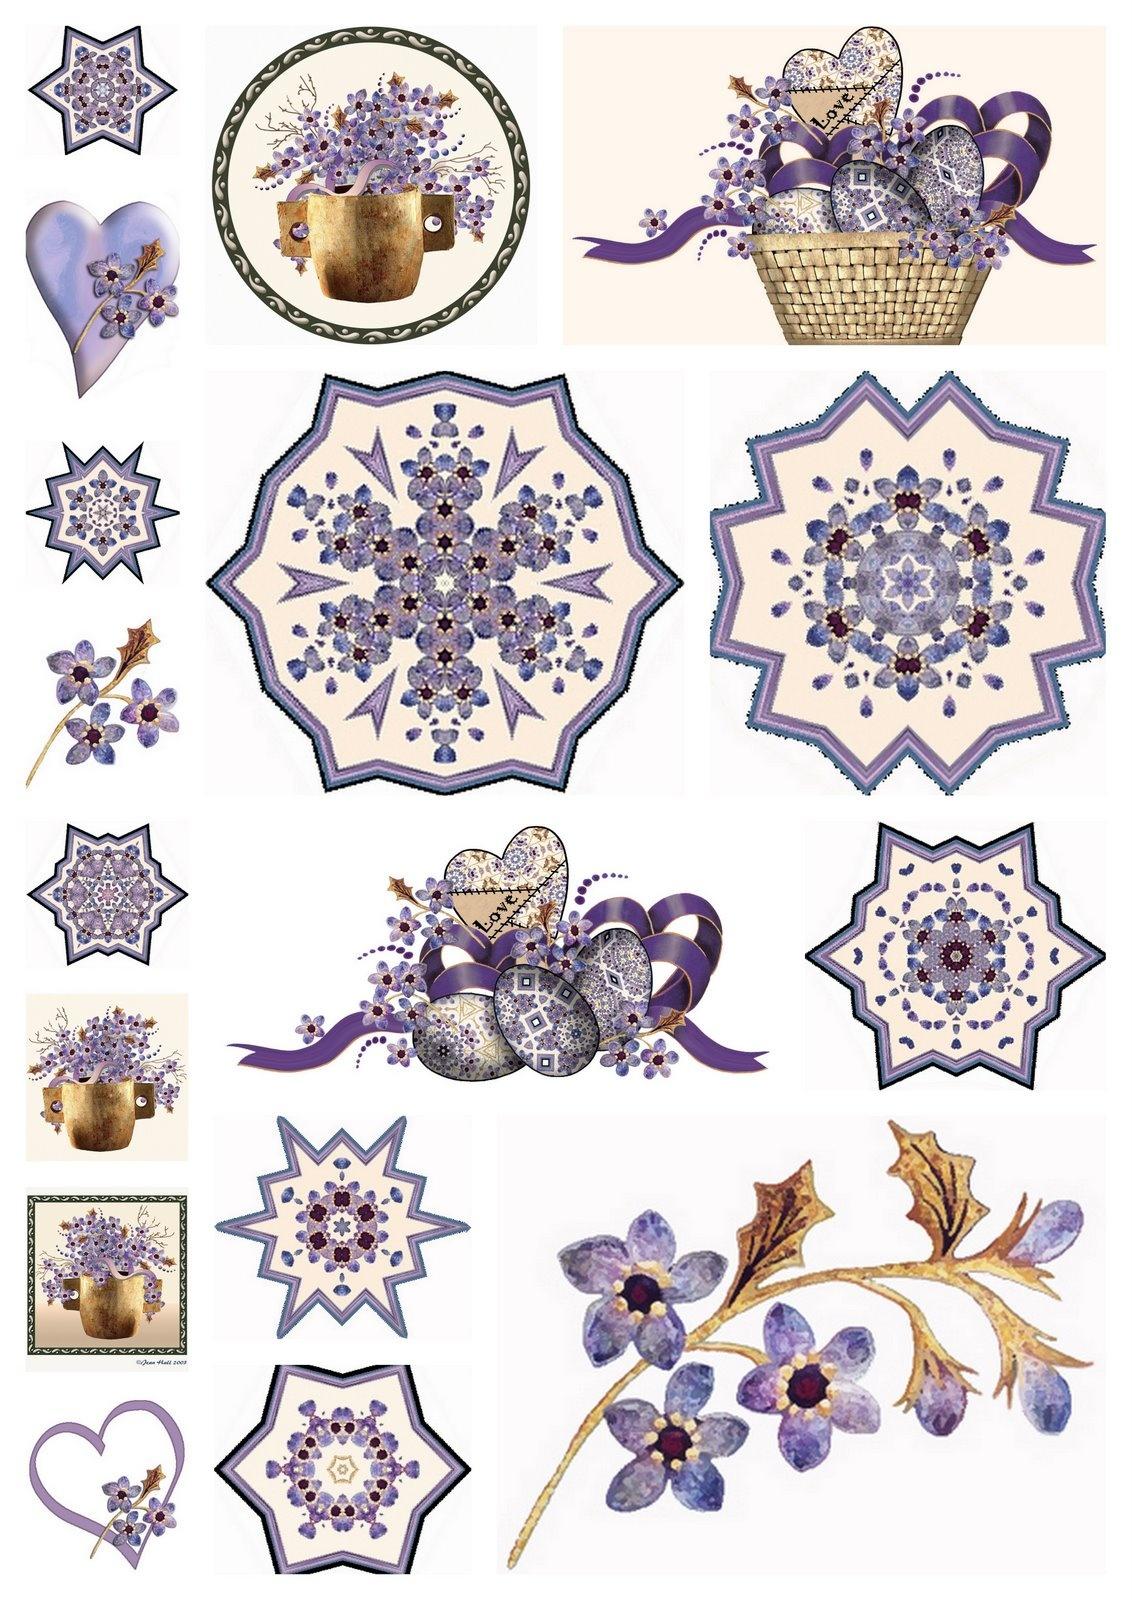 Artbyjean - Paper Crafts: Scrapbook Embellishments - Free Printable Scrapbook Decorations